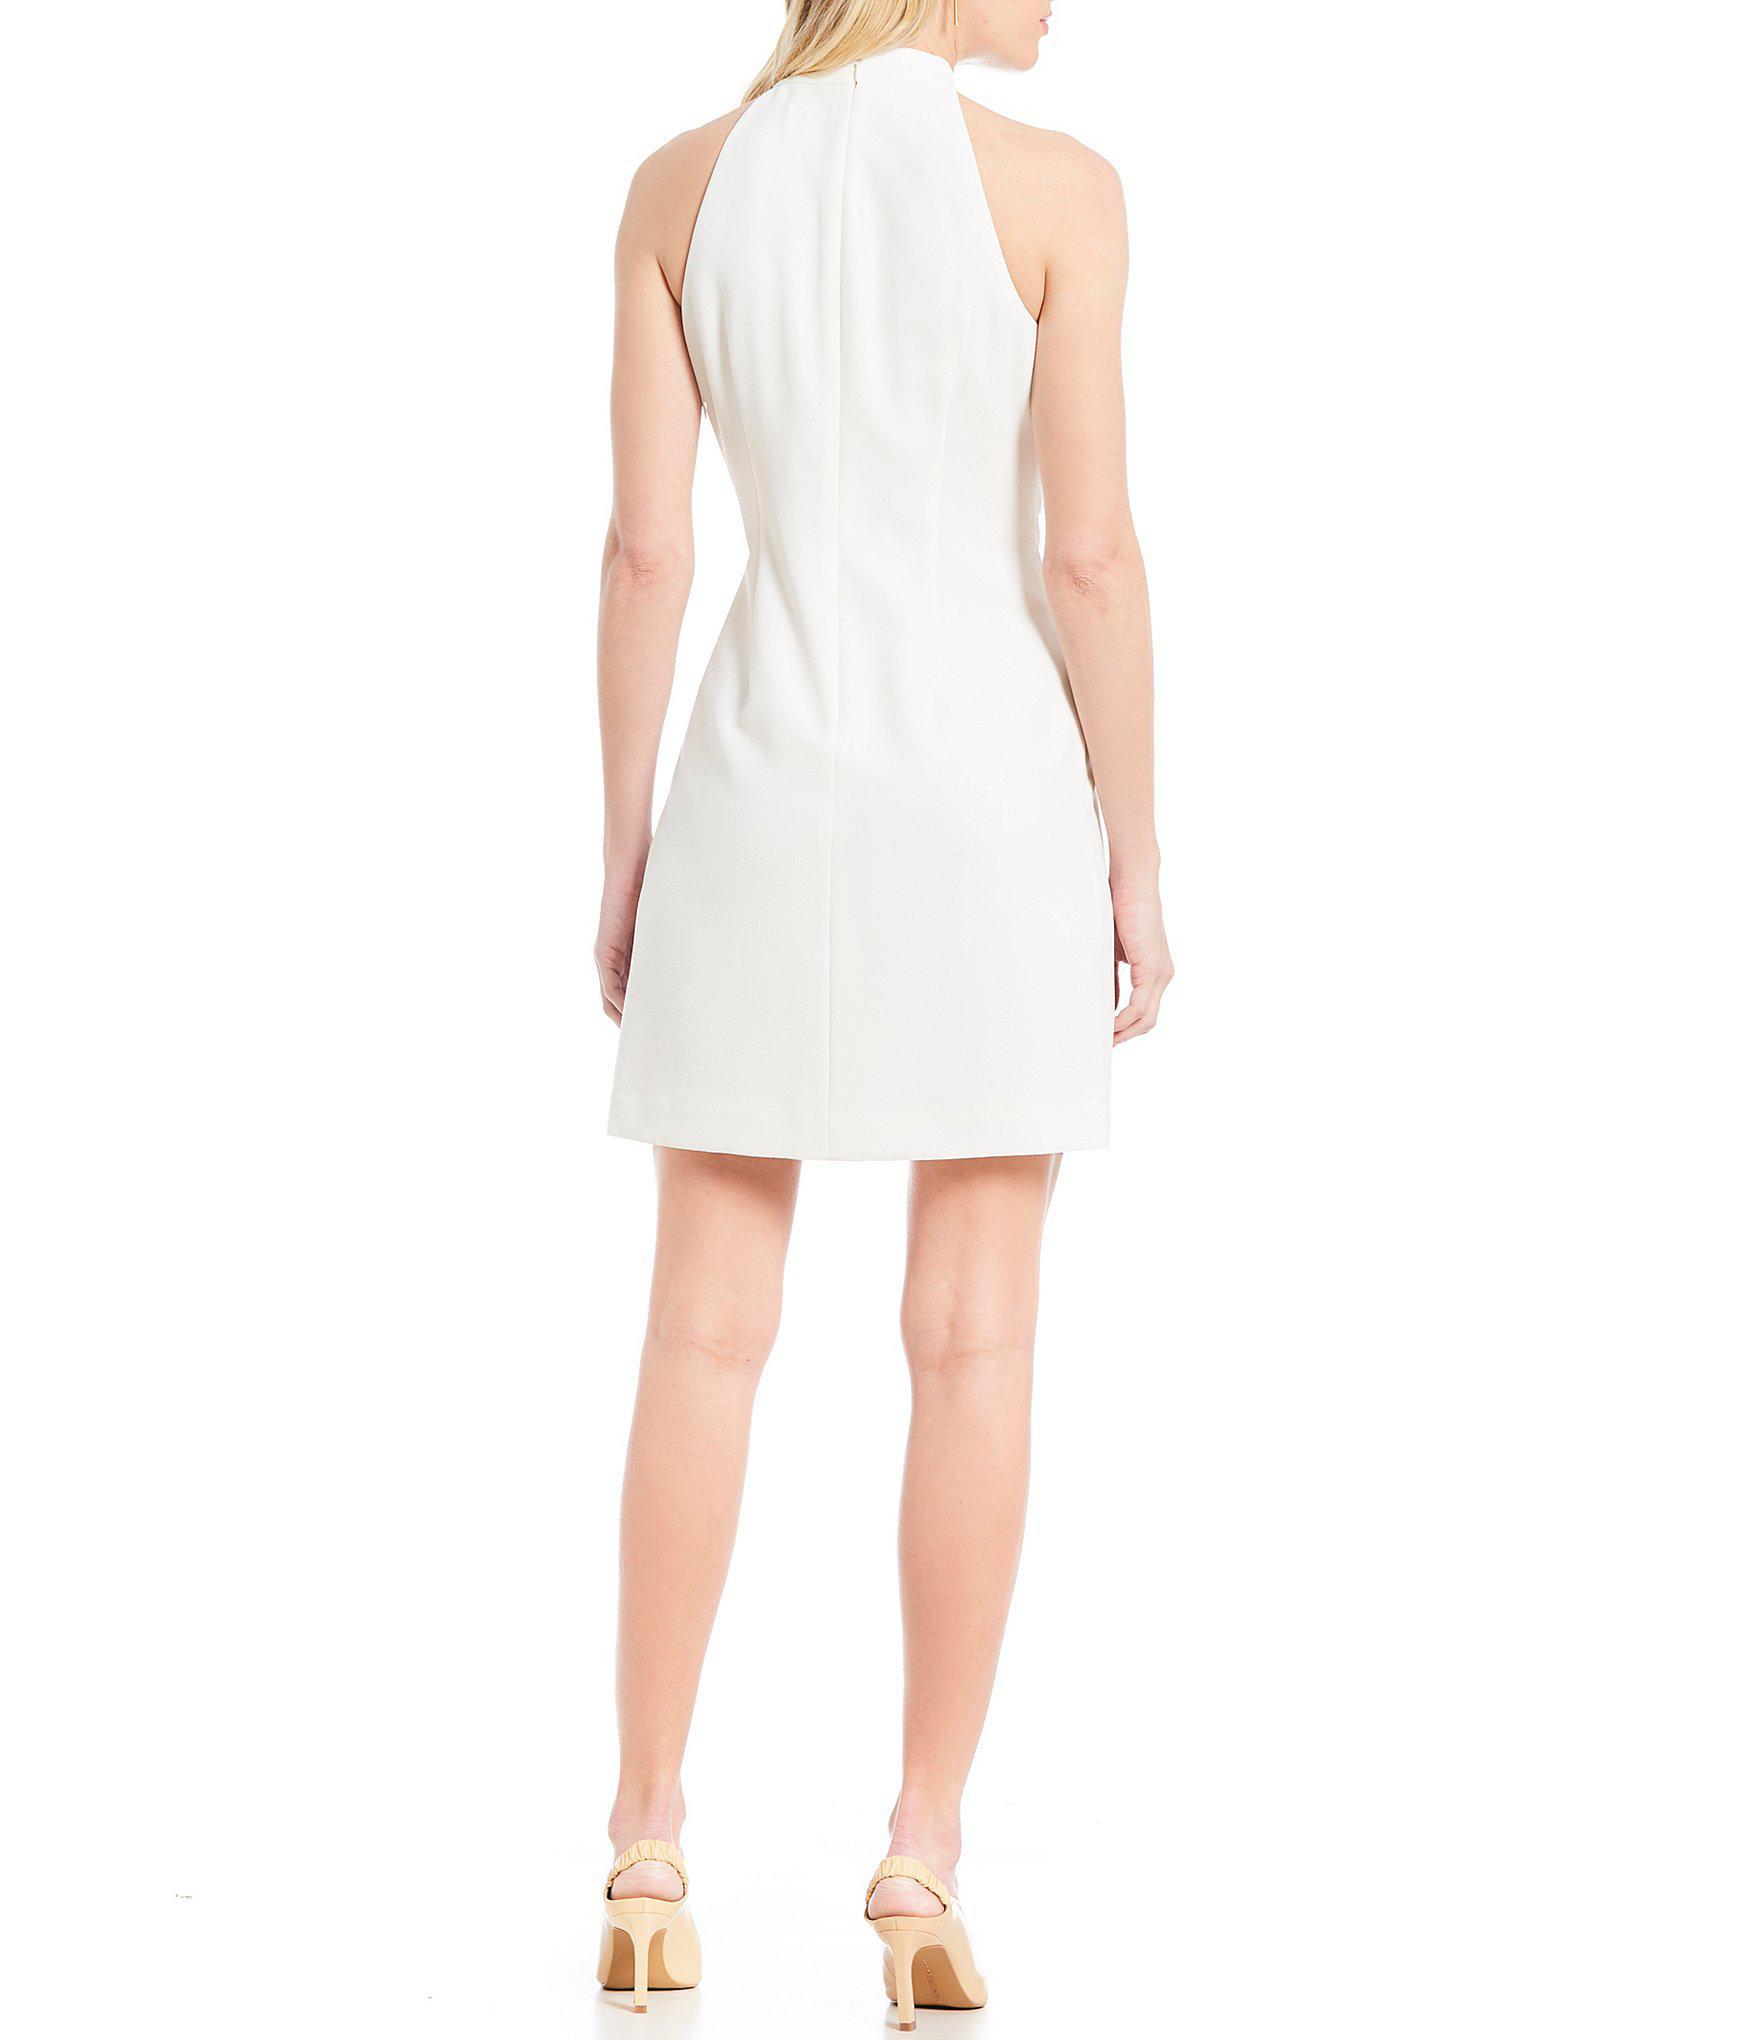 d78b9c0821c Vince Camuto - White Tie-neck Dress - Lyst. View fullscreen